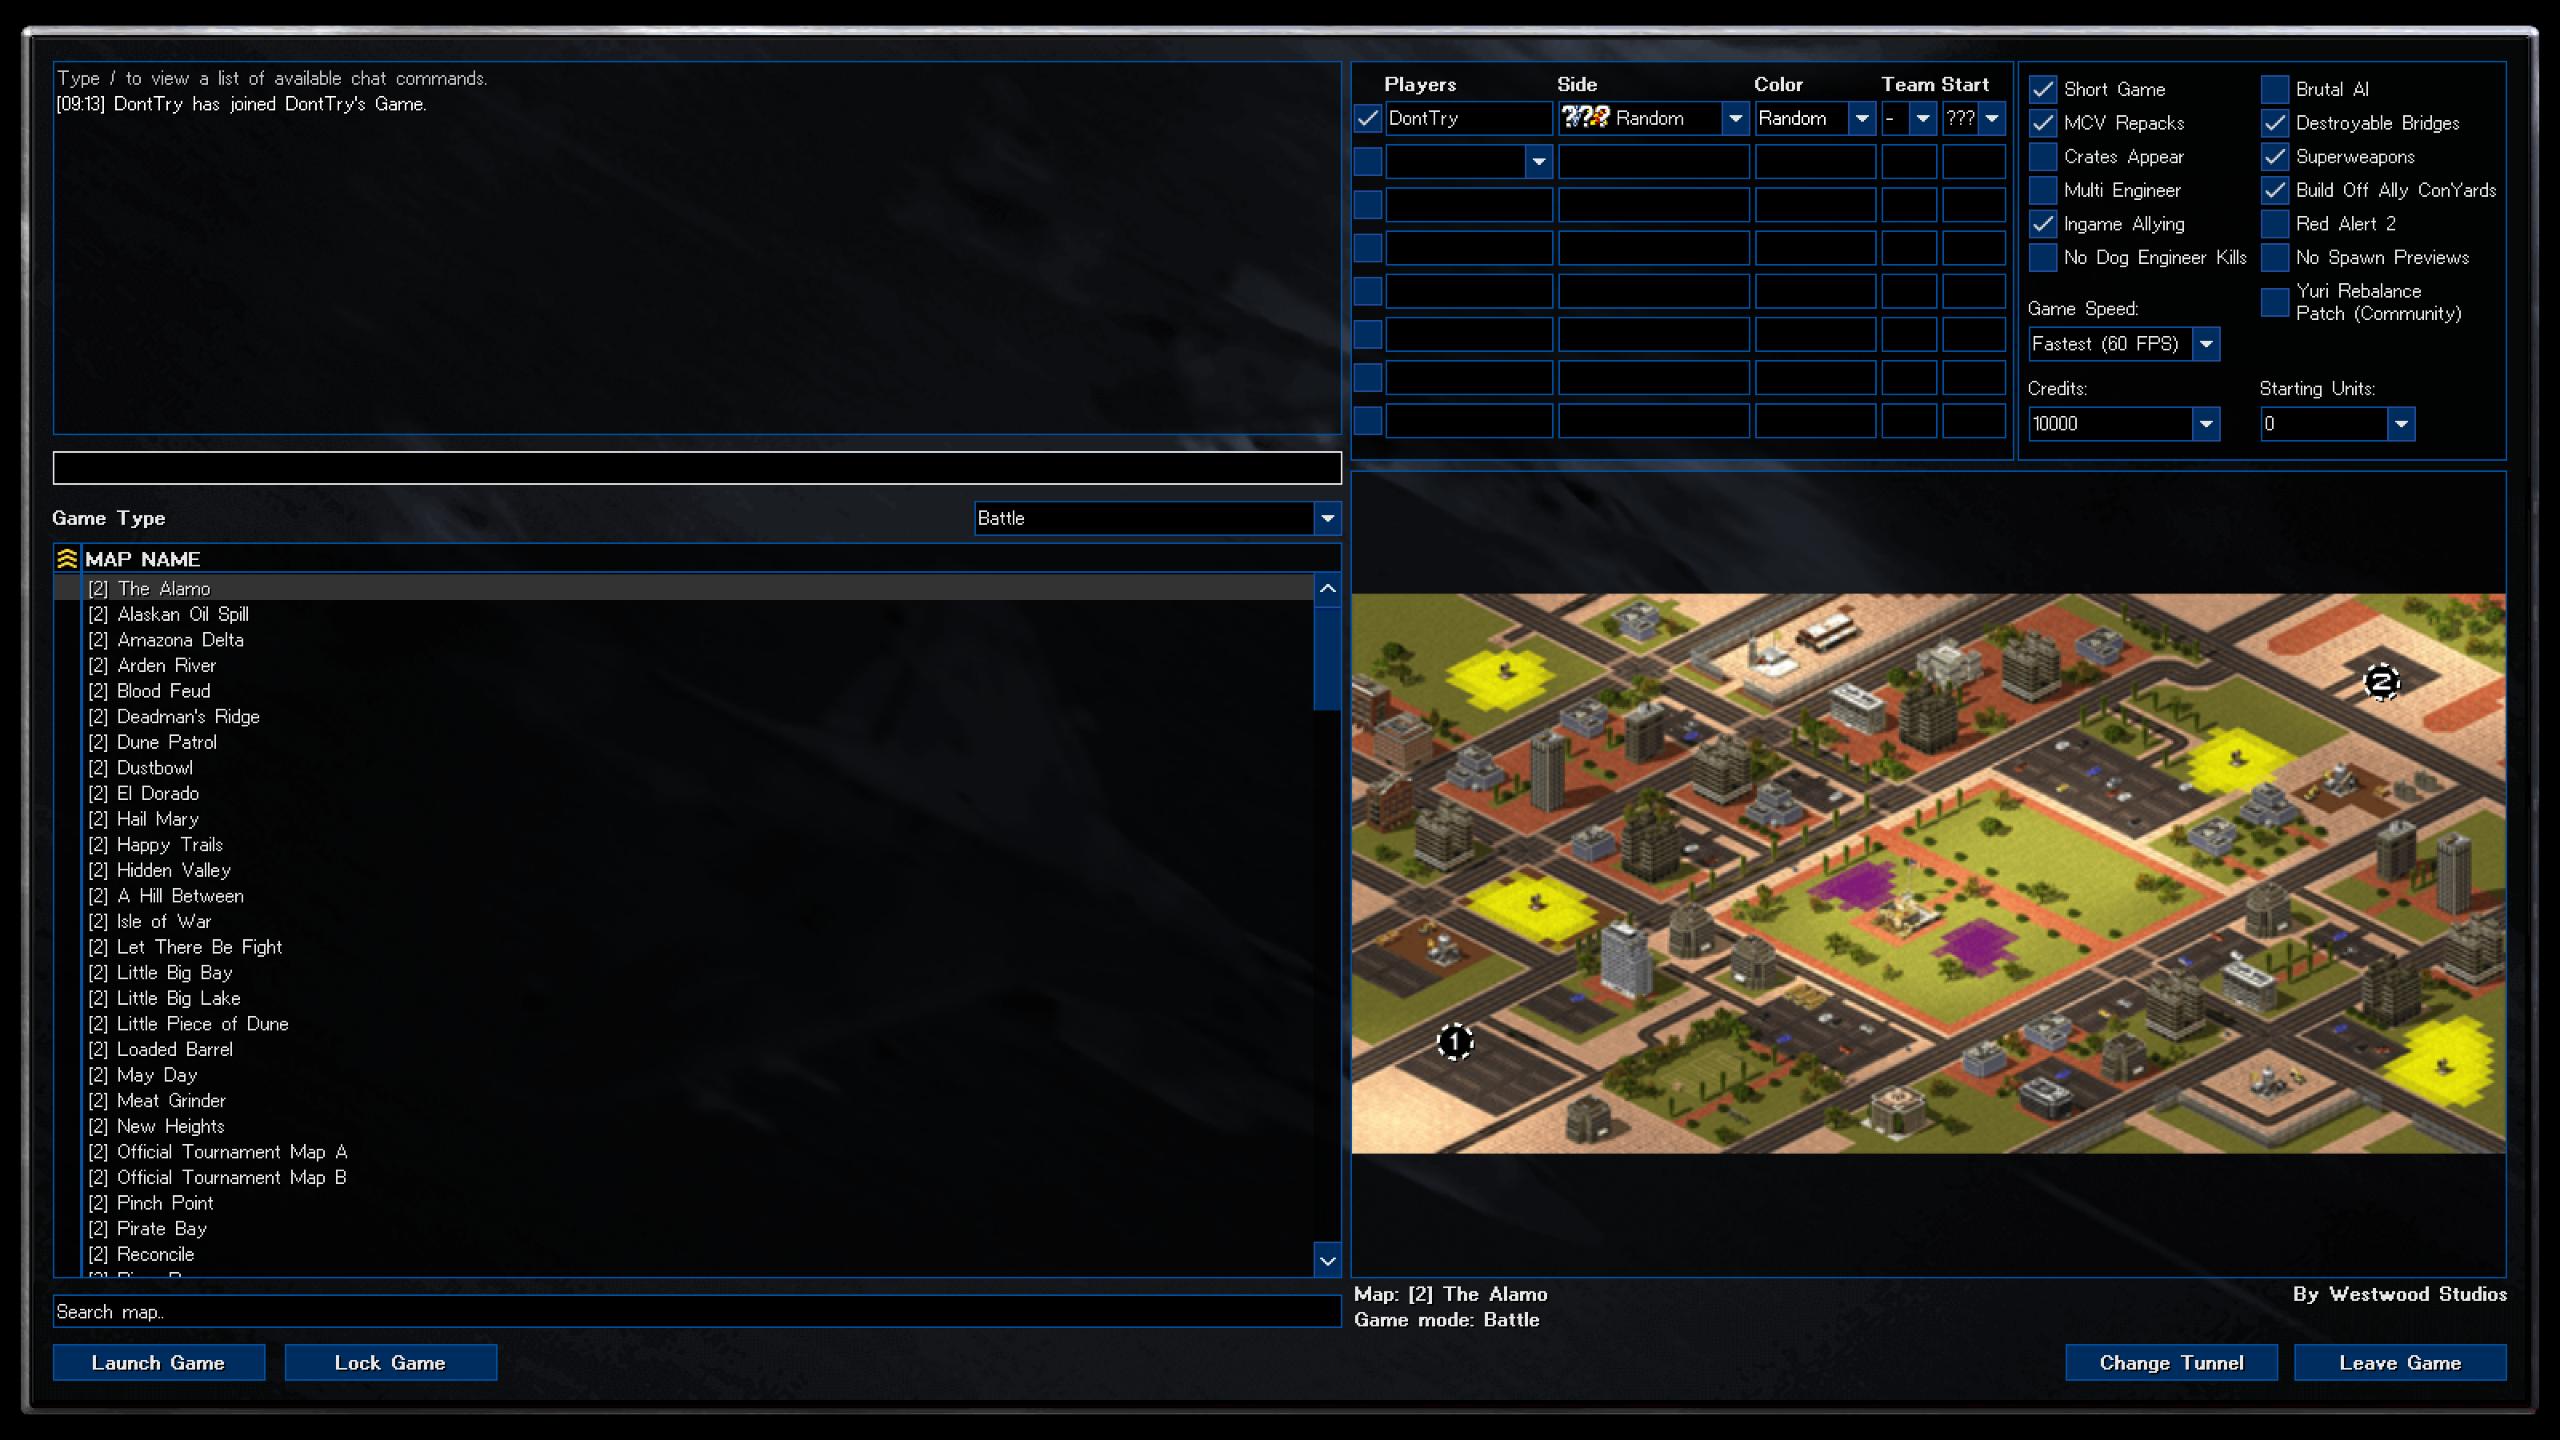 Allied Theme Custom Game Lobby